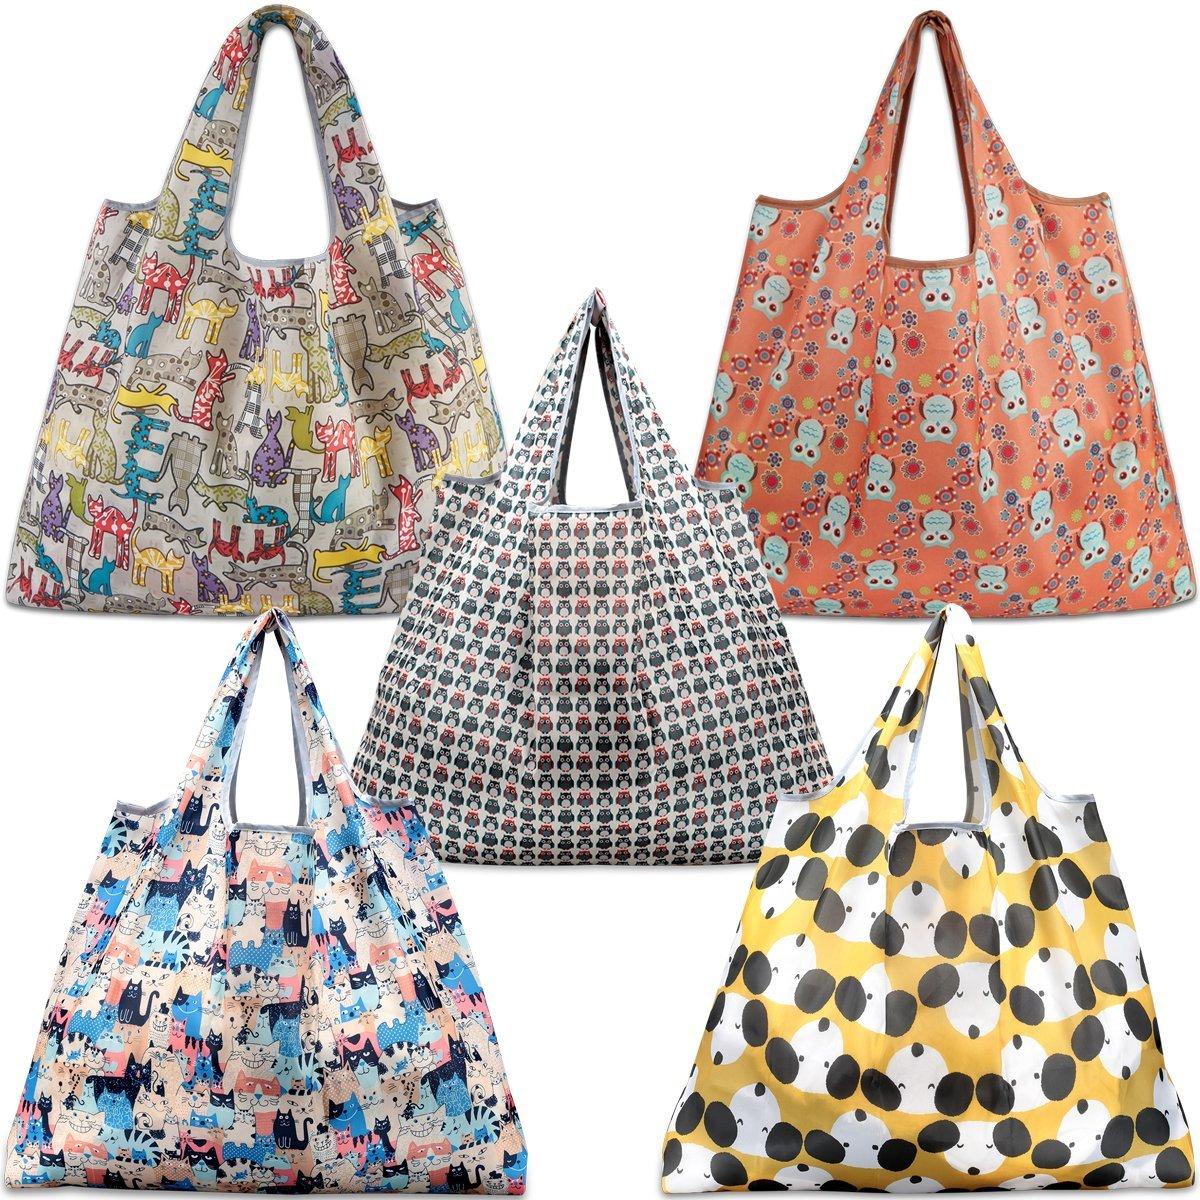 ea9ea39d36 Details about KINGMAS Reusable Grocery Bags, Set of 5 Eco-Friendly Folding Tote  Shopping Bag